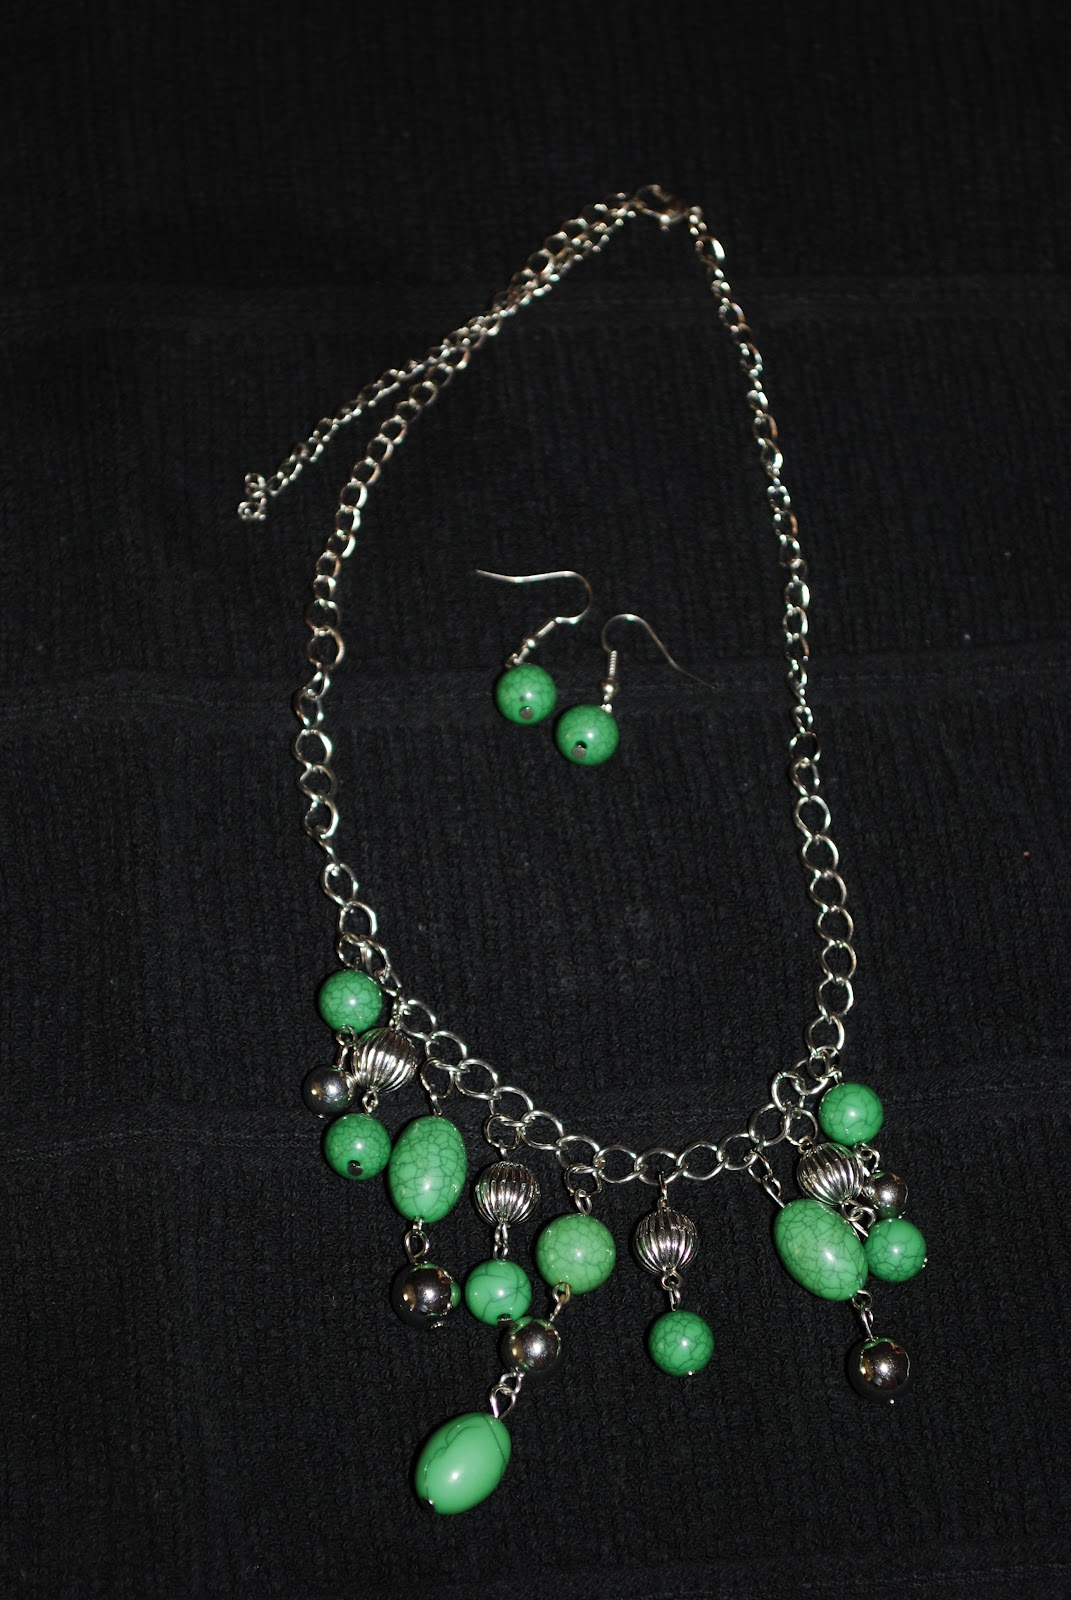 Pocatello paparazzi for Paparazzi jewelry wholesale prices